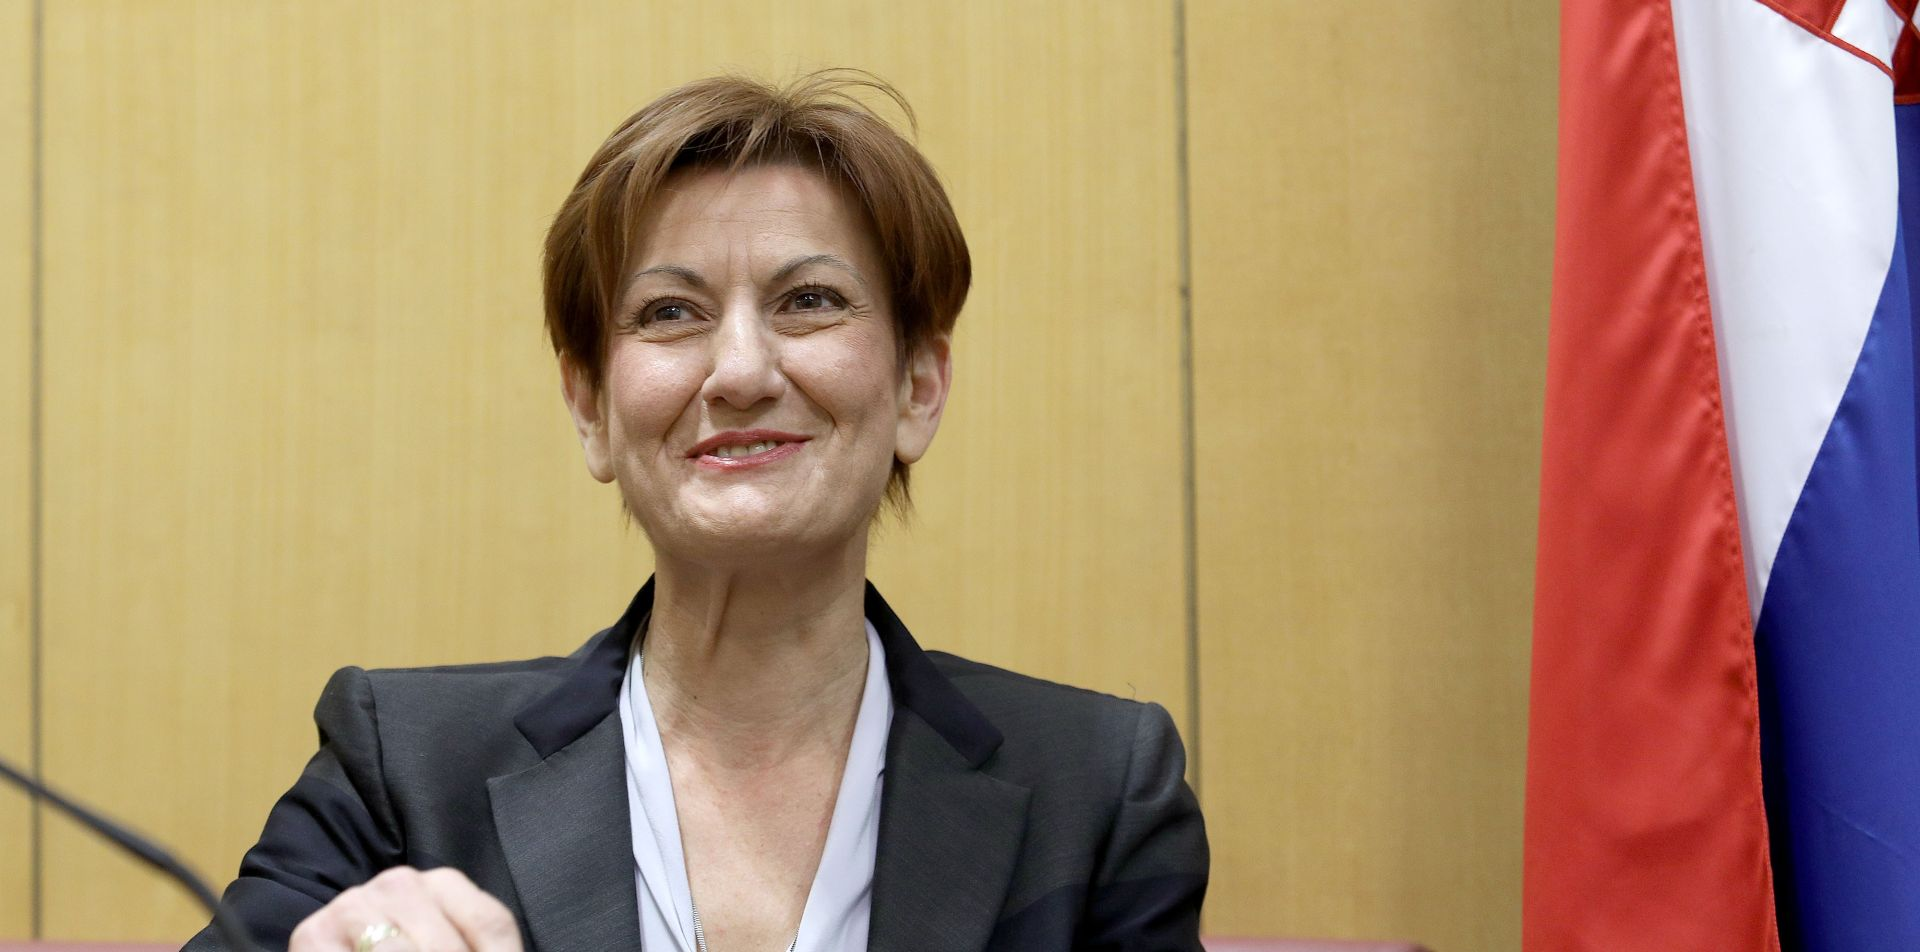 "MARTINA DALIĆ ""Oporba ima pravo na vesele doskočice kako bi mediji prepoznali njihove rasprave"""